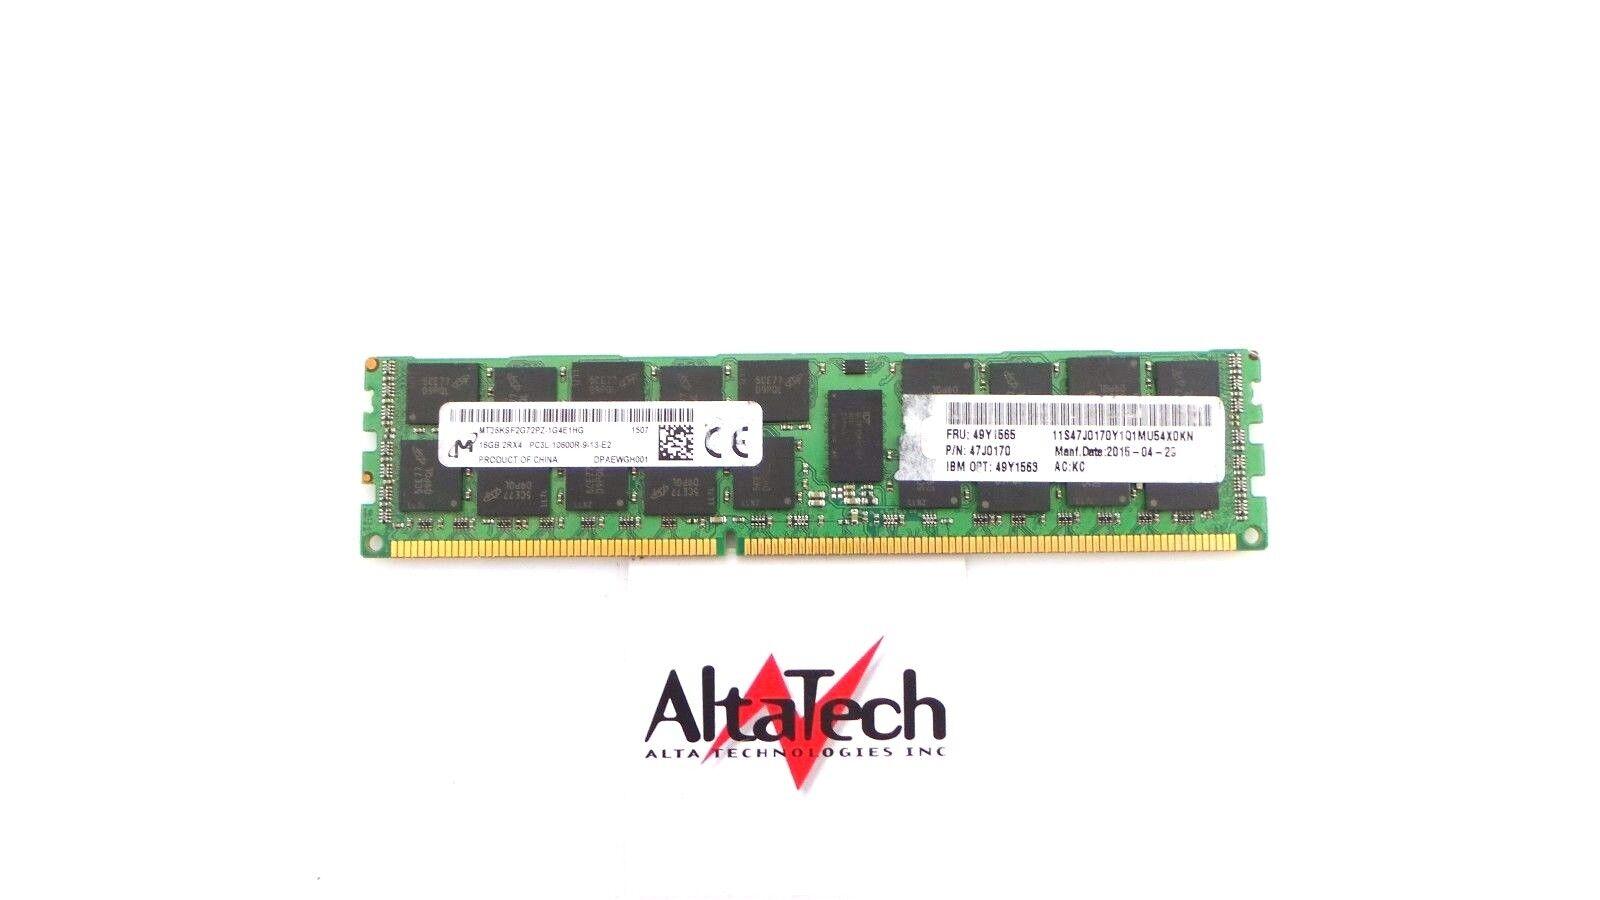 IBM//Lenovo 49Y1565 16GB 2RX4 PC3L-10600R MEMORY 49Y1563 47J0170 49Y1562 1X16GB